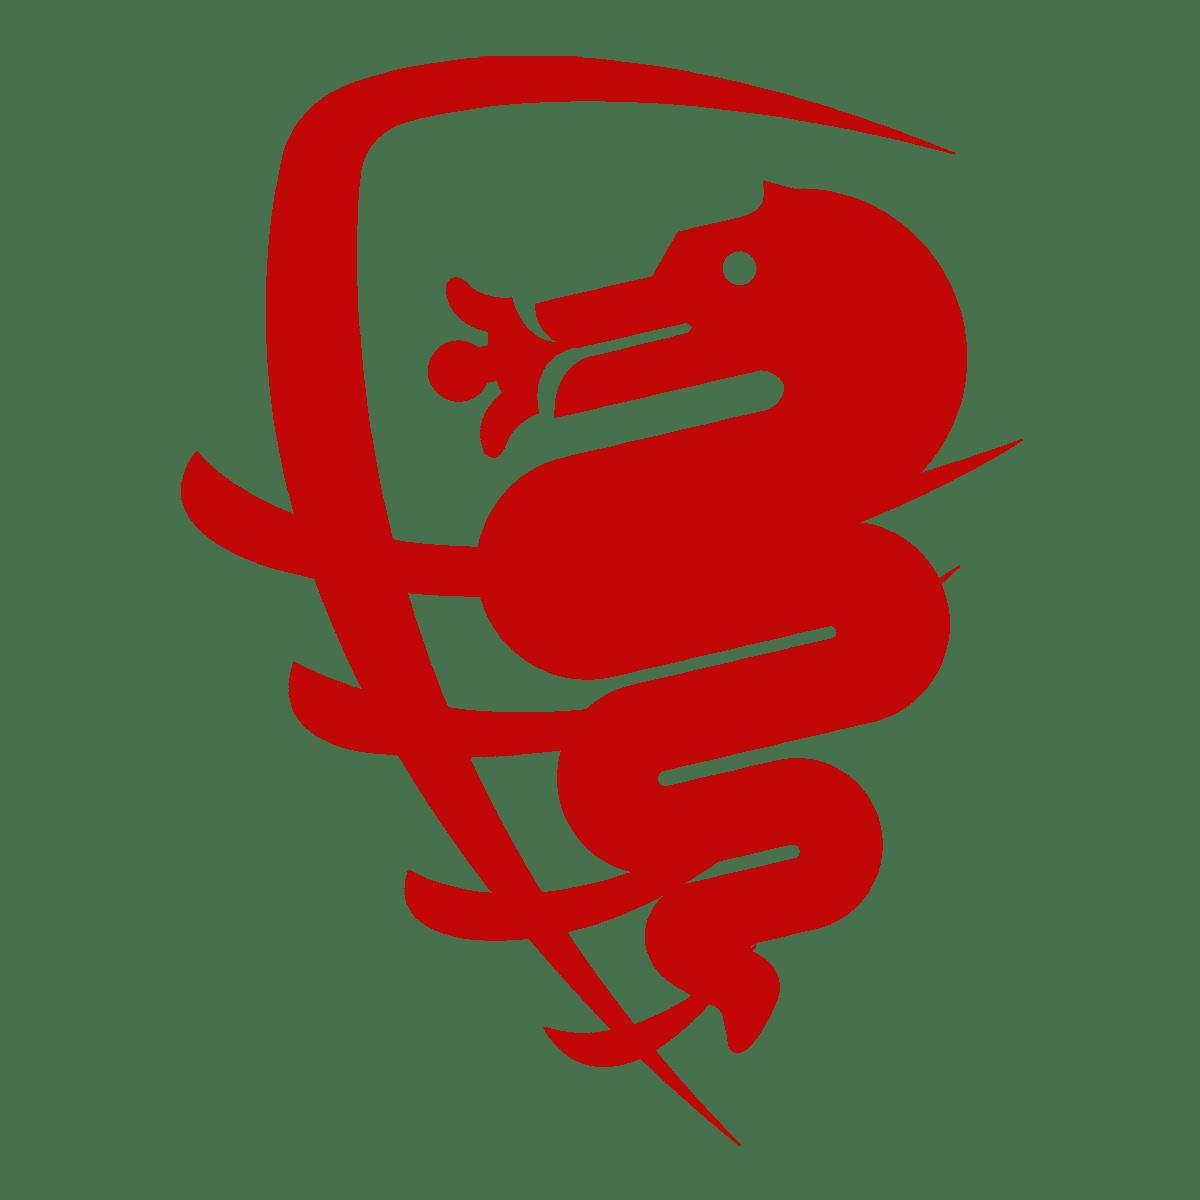 Logo-Square-1200x1200.png